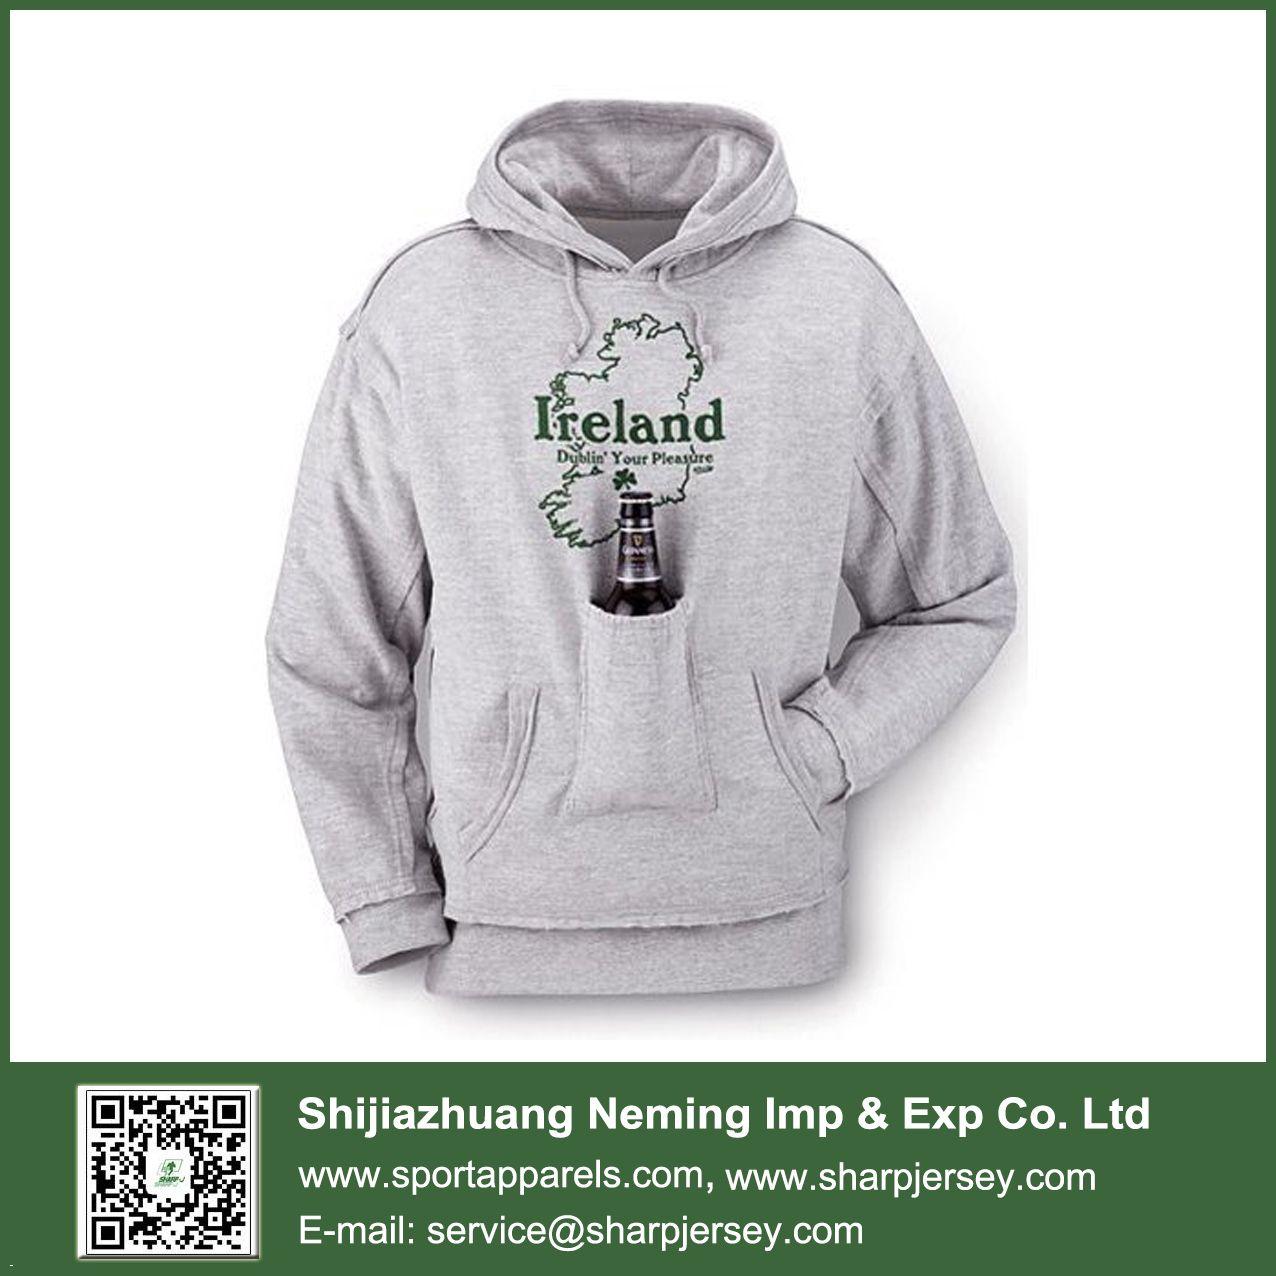 Men's Hooded Sweatshirts | Leisure Wear | Sweatshirts For Men | Hoodies And  Sweatshirts - Shijiazhuang